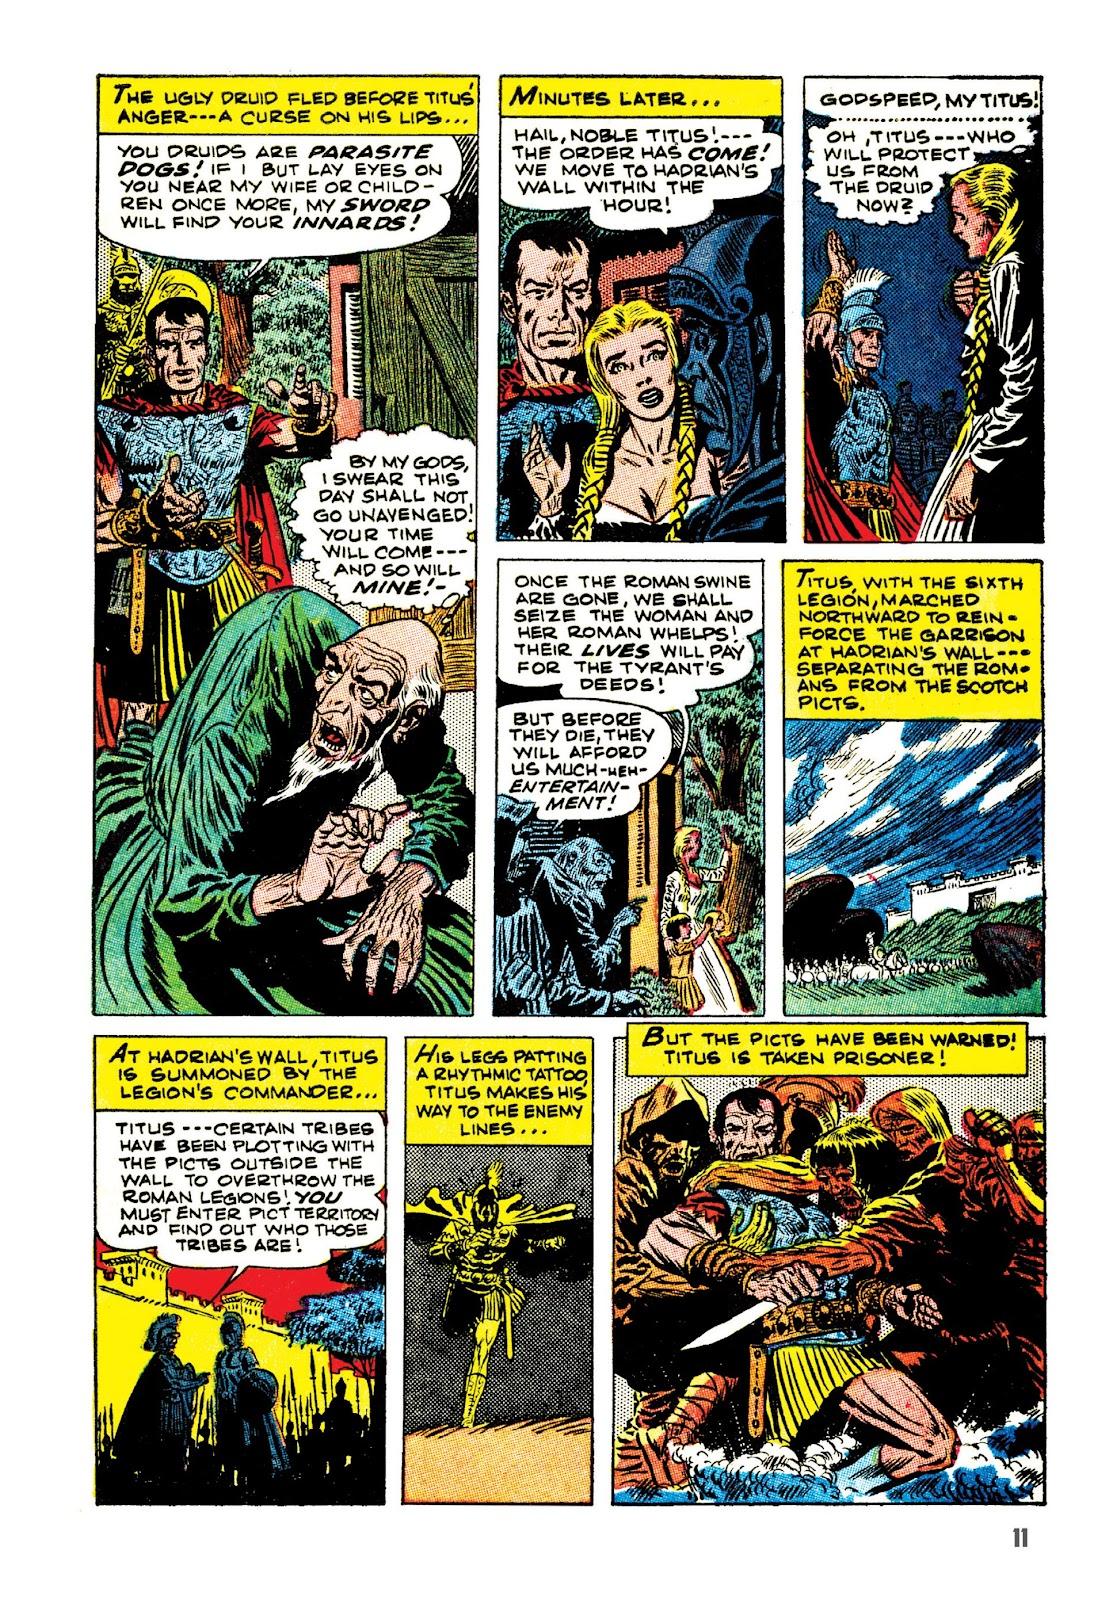 Read online The Joe Kubert Archives comic -  Issue # TPB (Part 1) - 22